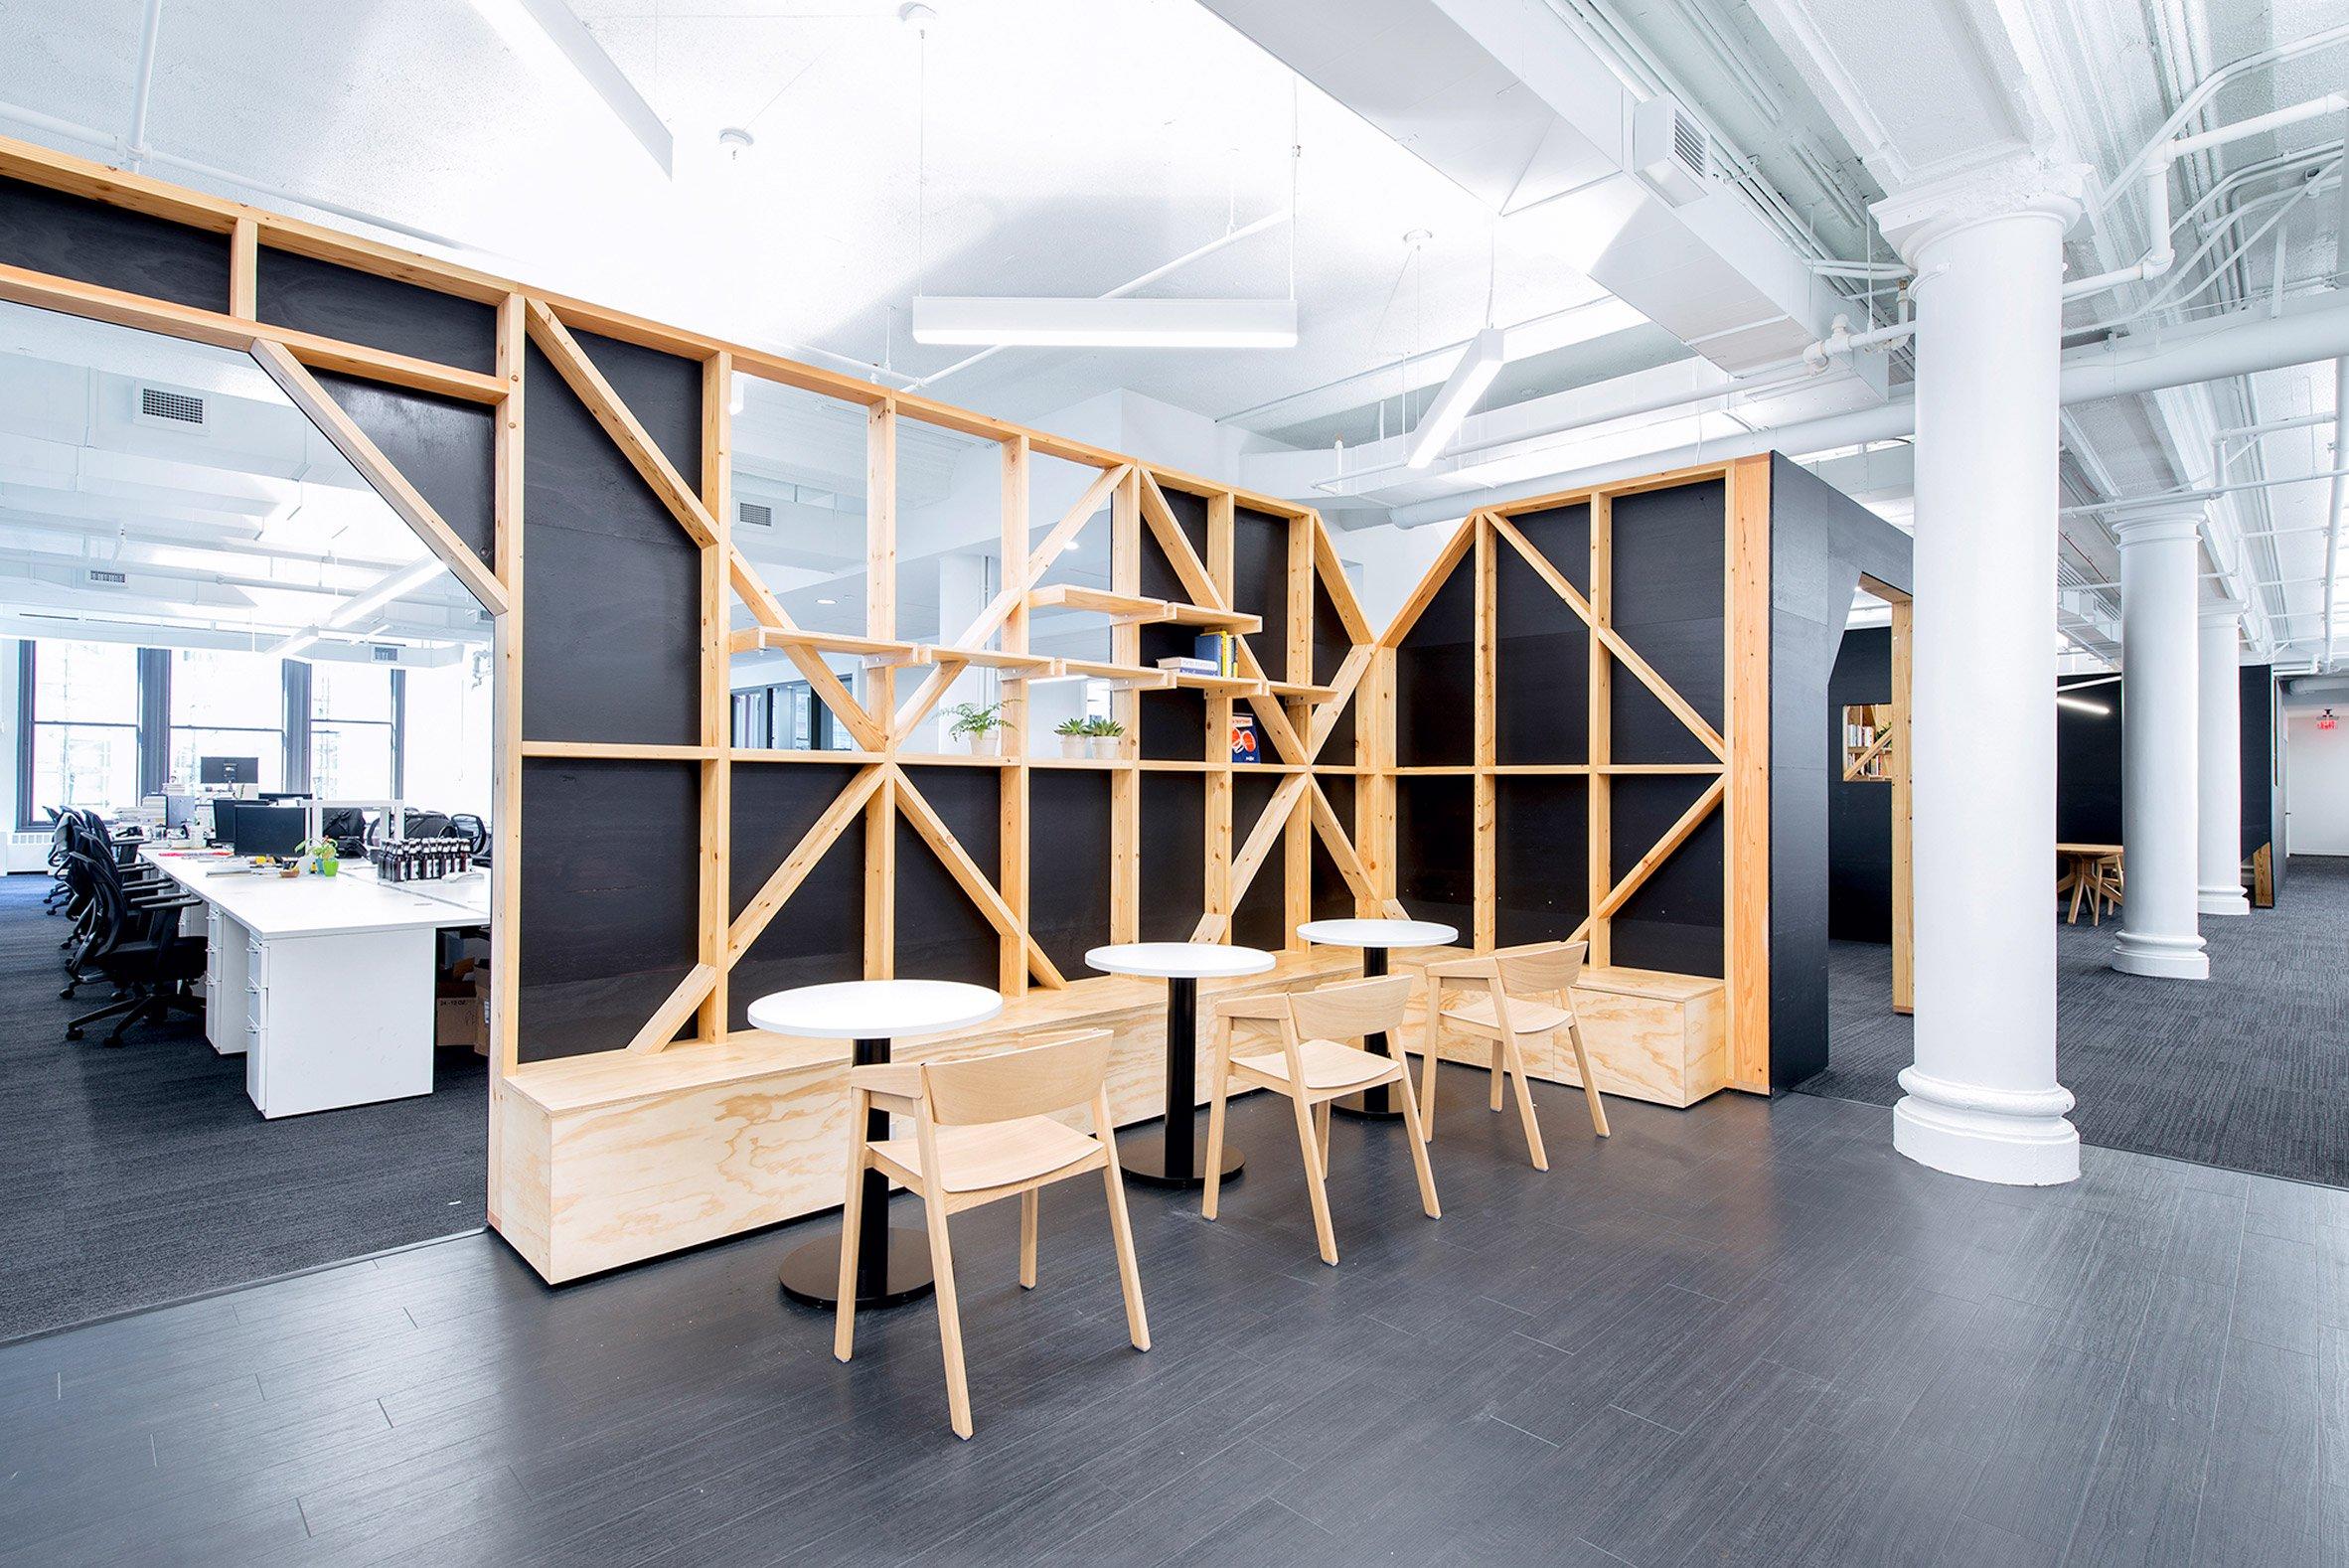 architecture-interiors-offices- manhatten-new-york-design-studia-osnovadesign-osnova-poltava_05